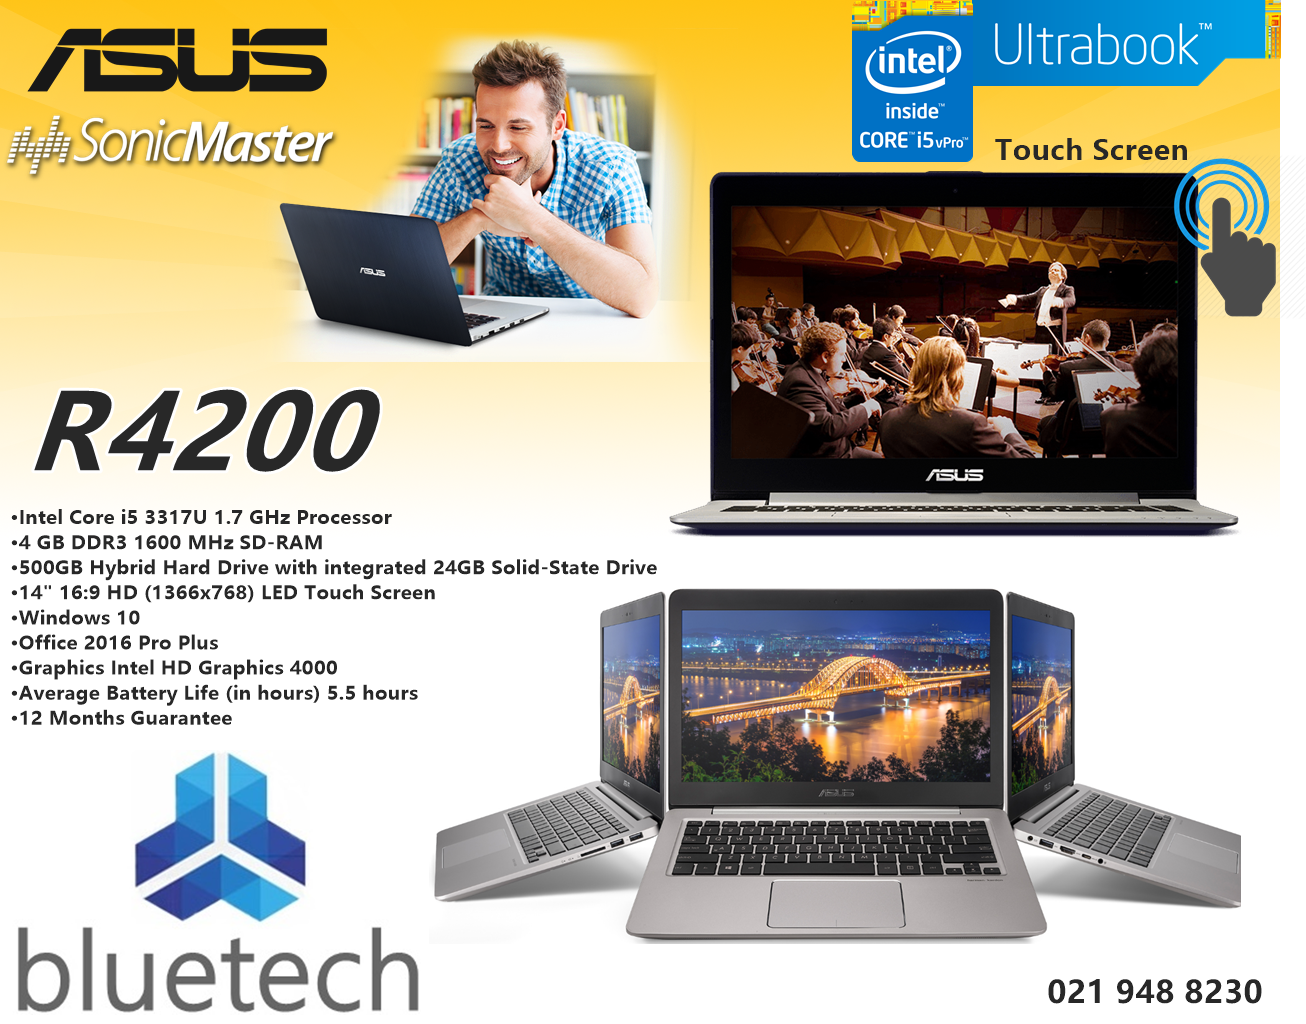 ASUS S400C 14-Inch TouchScreen Laptop Core i5 - 4GB ram - 500GB HHD. Bluetech